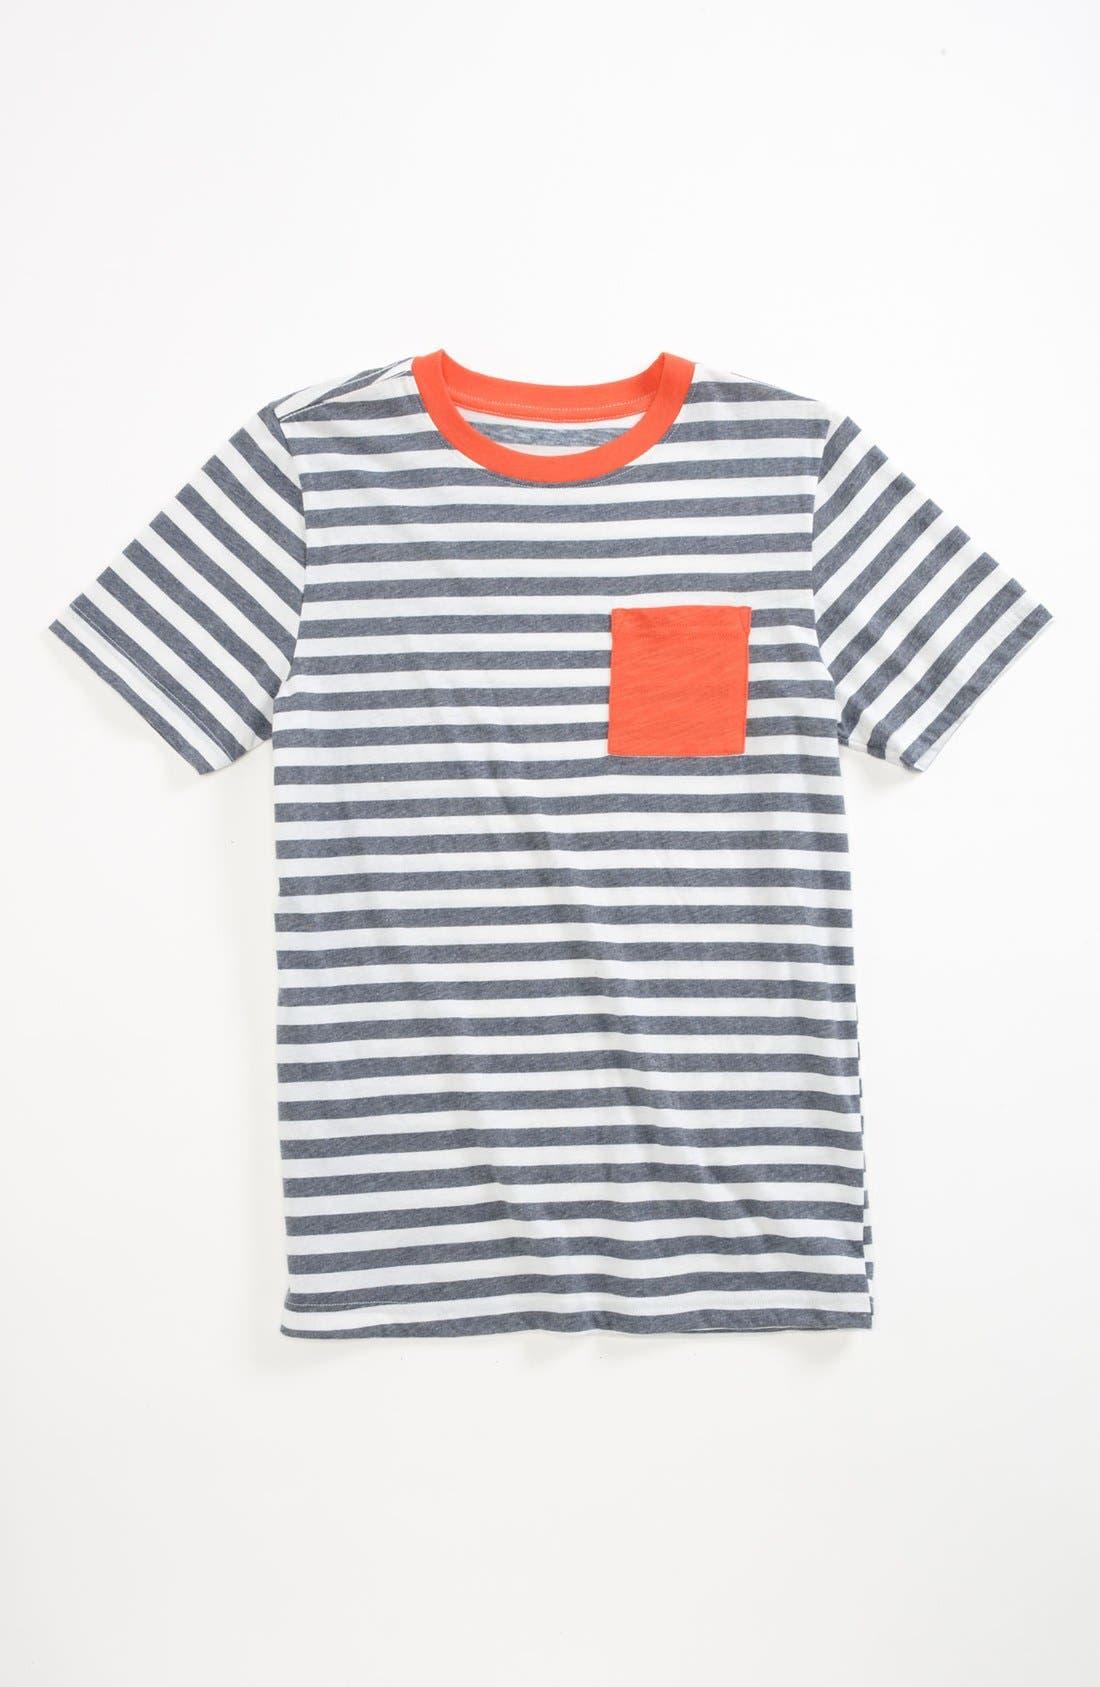 Alternate Image 1 Selected - Tucker + Tate 'Northlake' T-Shirt (Little Boys)